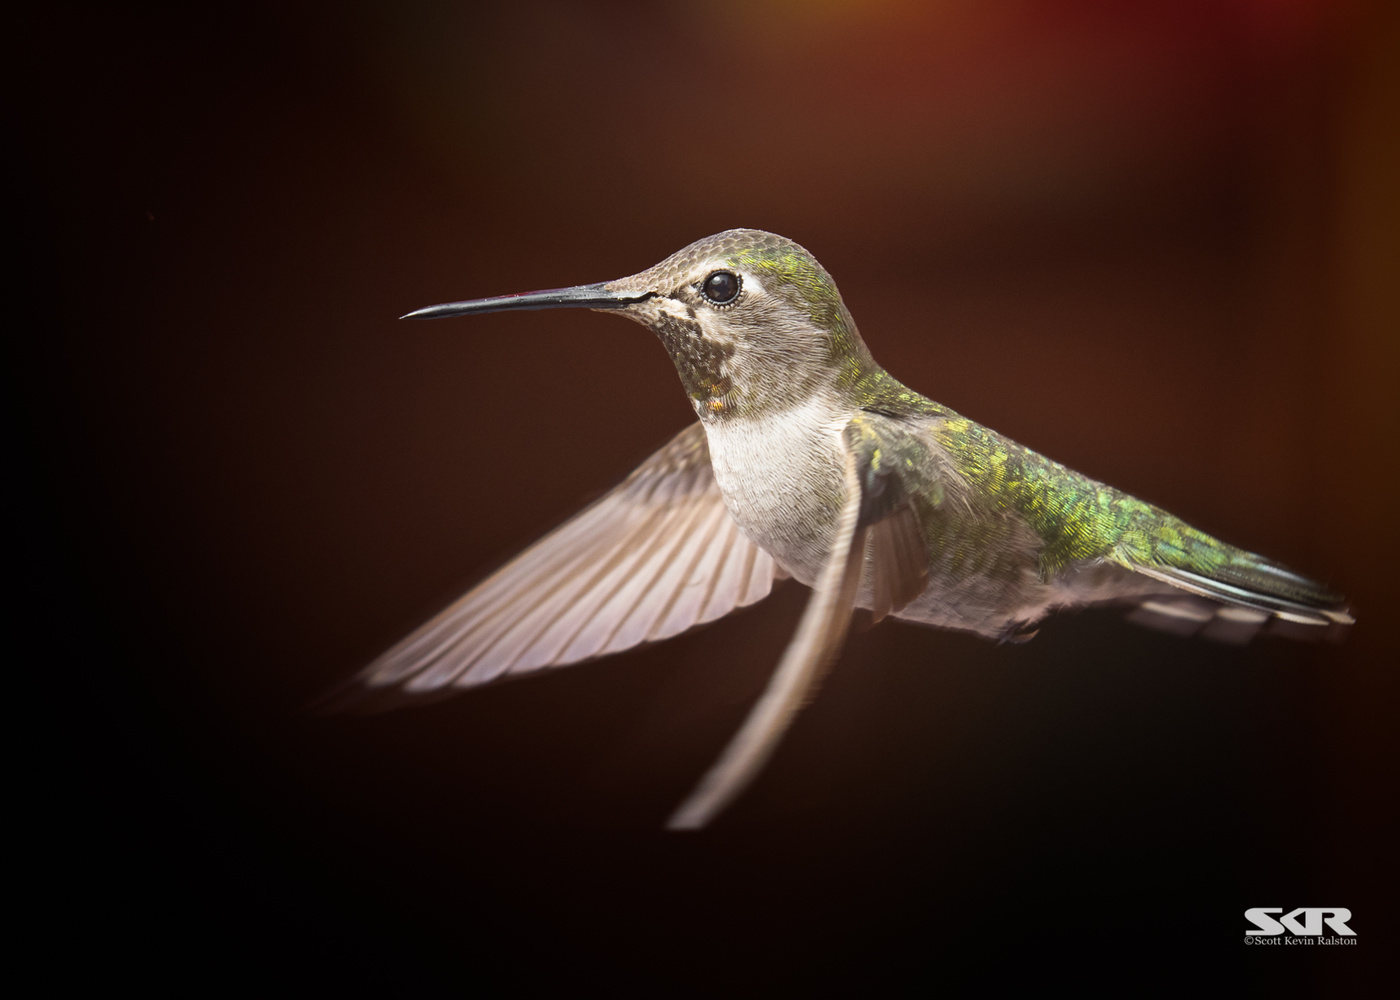 Hummingbird in flight by Scott Ralston